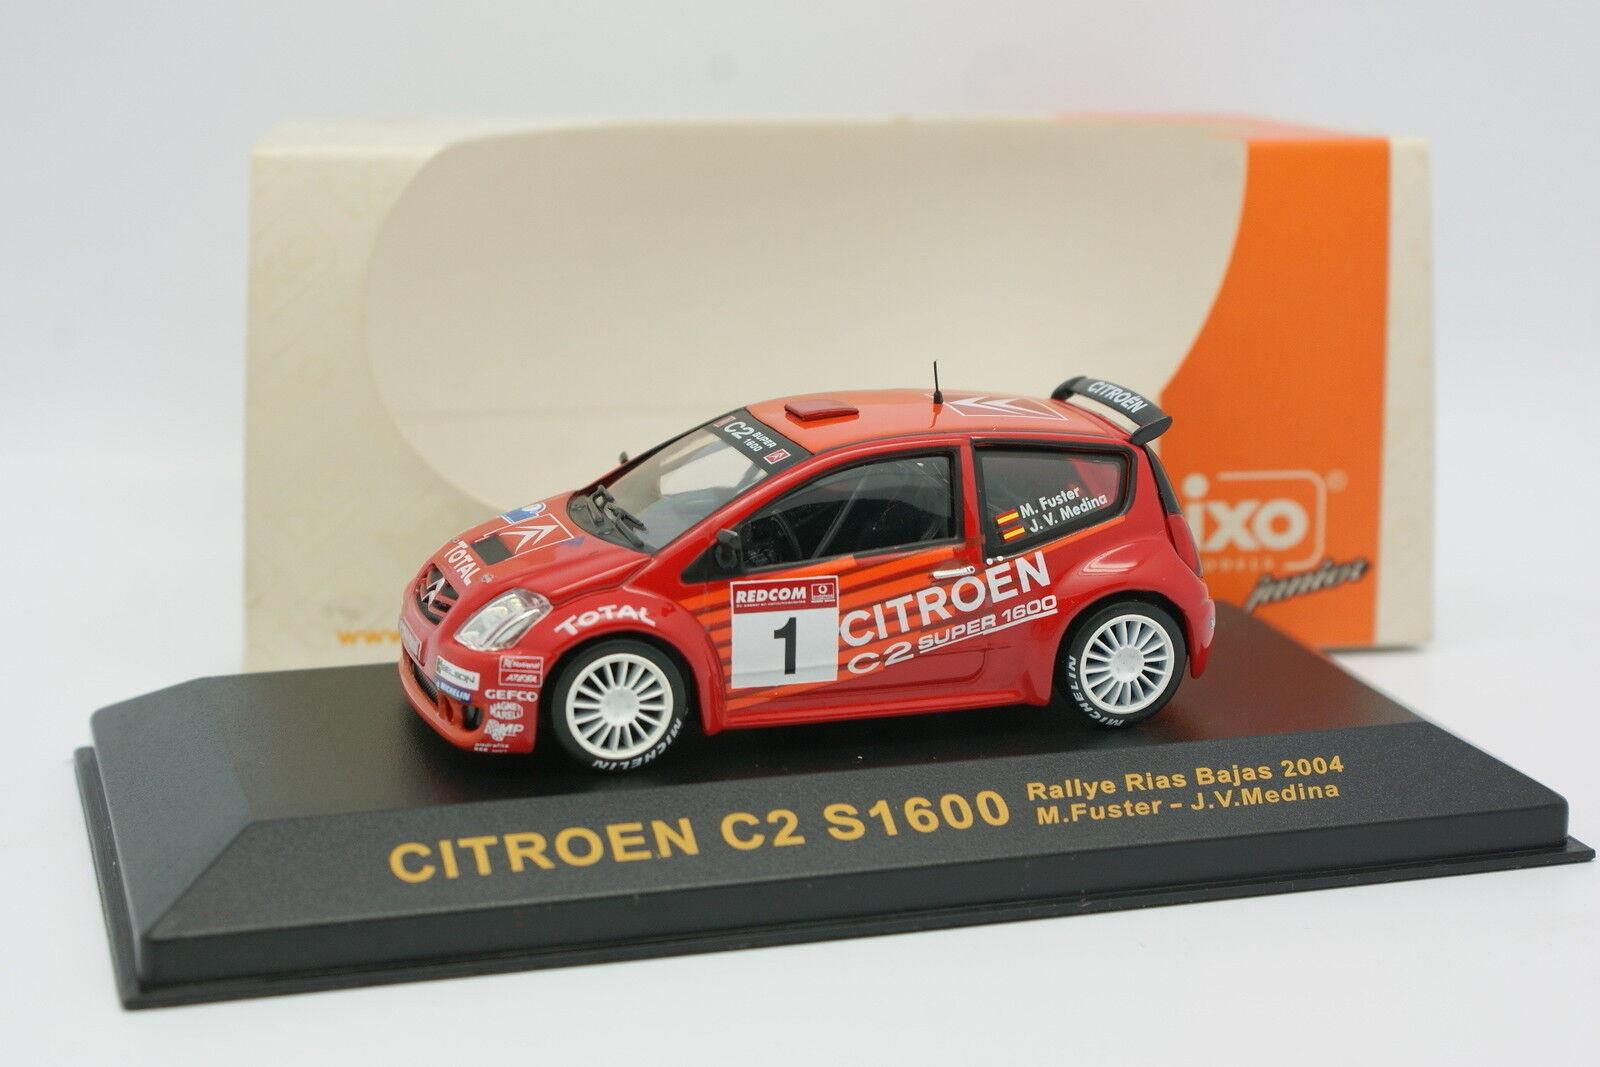 Ixo 1 43 - Citroen C2 S1600 S1600 S1600 Rias Bajas Rally 2004 6e7f1e